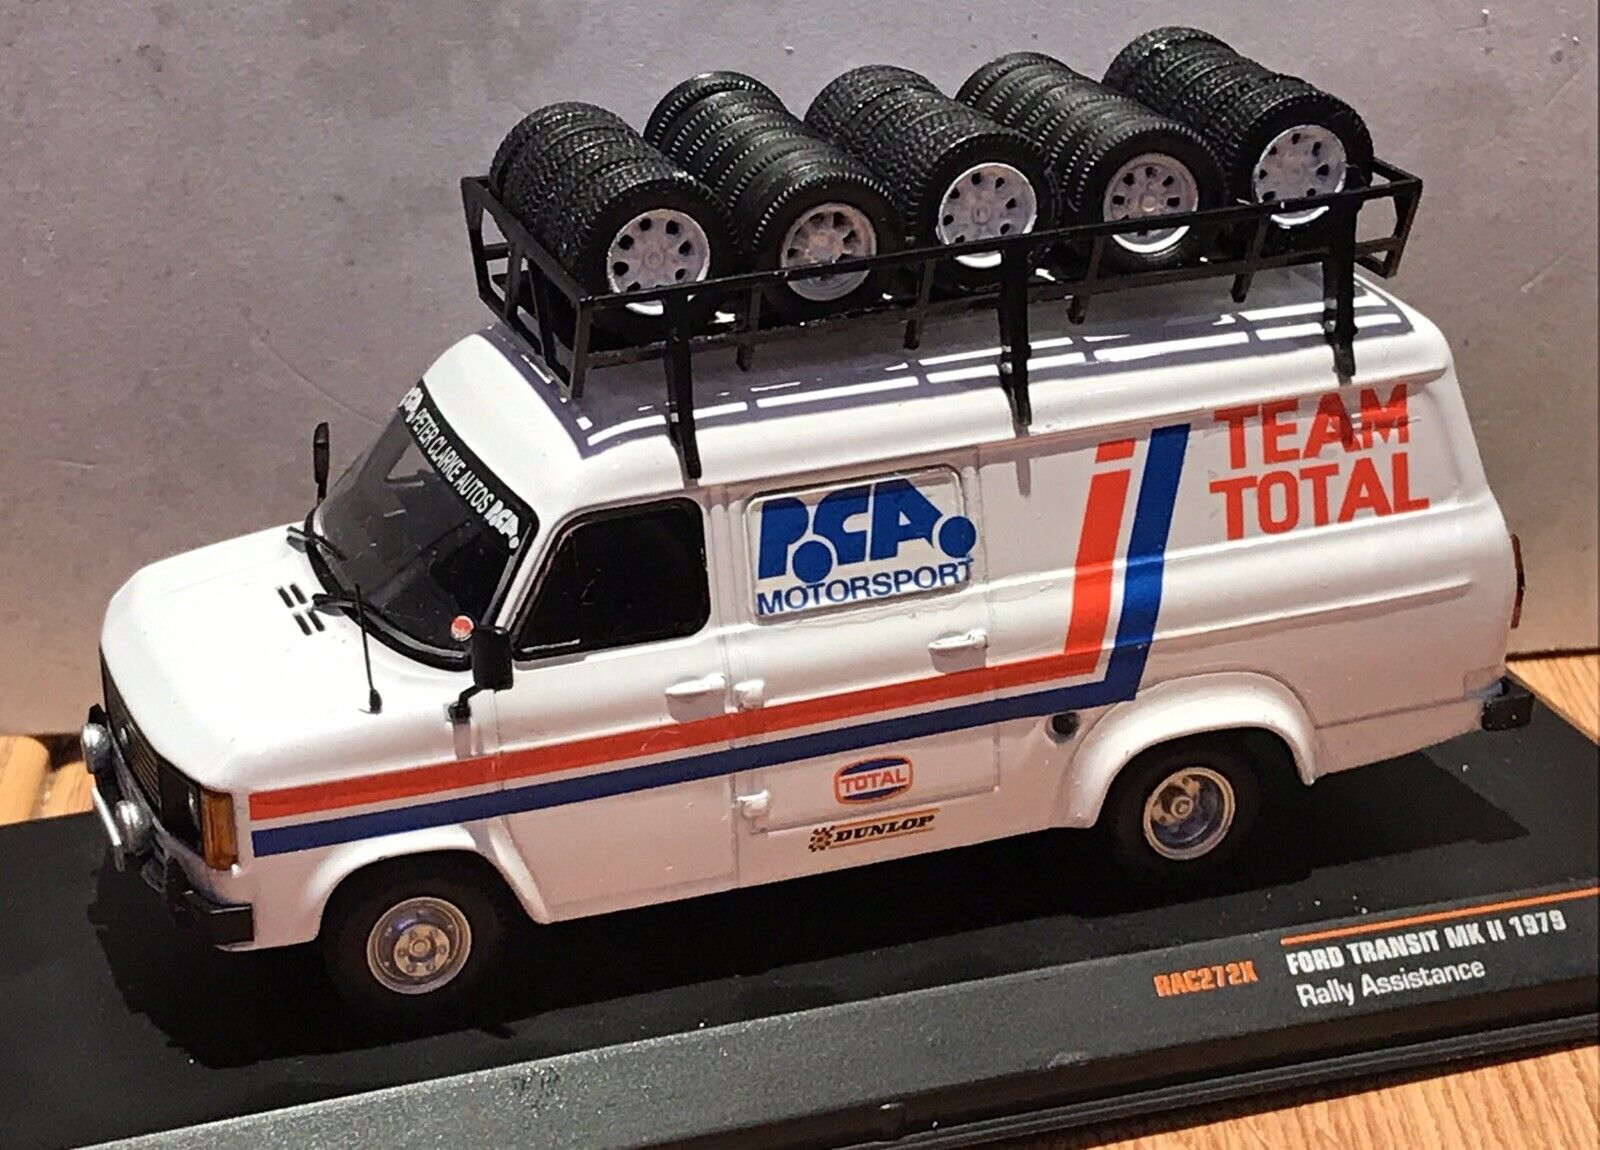 IXO 1 43 FORD TRANSIT MkII code 3 PCA  Motorsport Service Van assistance rallye  juste l'acheter